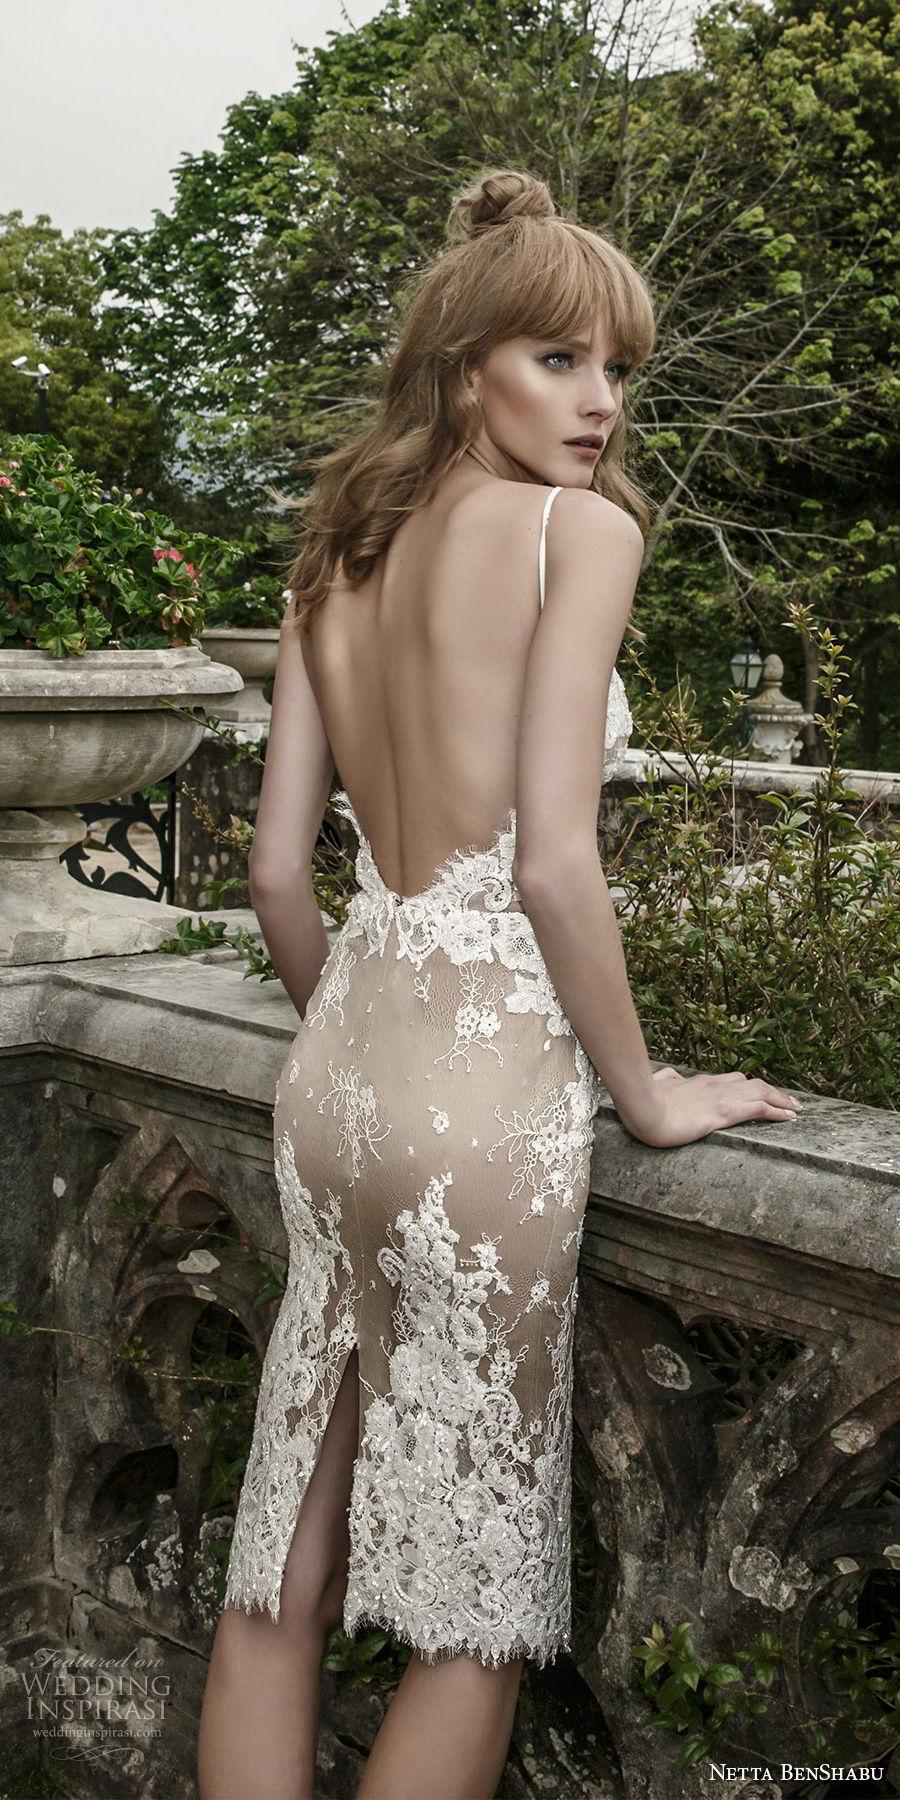 netta benshabu 2017 bridal spaghetti strap sweetheart neckline full embellishment elegant nude color sheath short wedding dress open back (2) bv